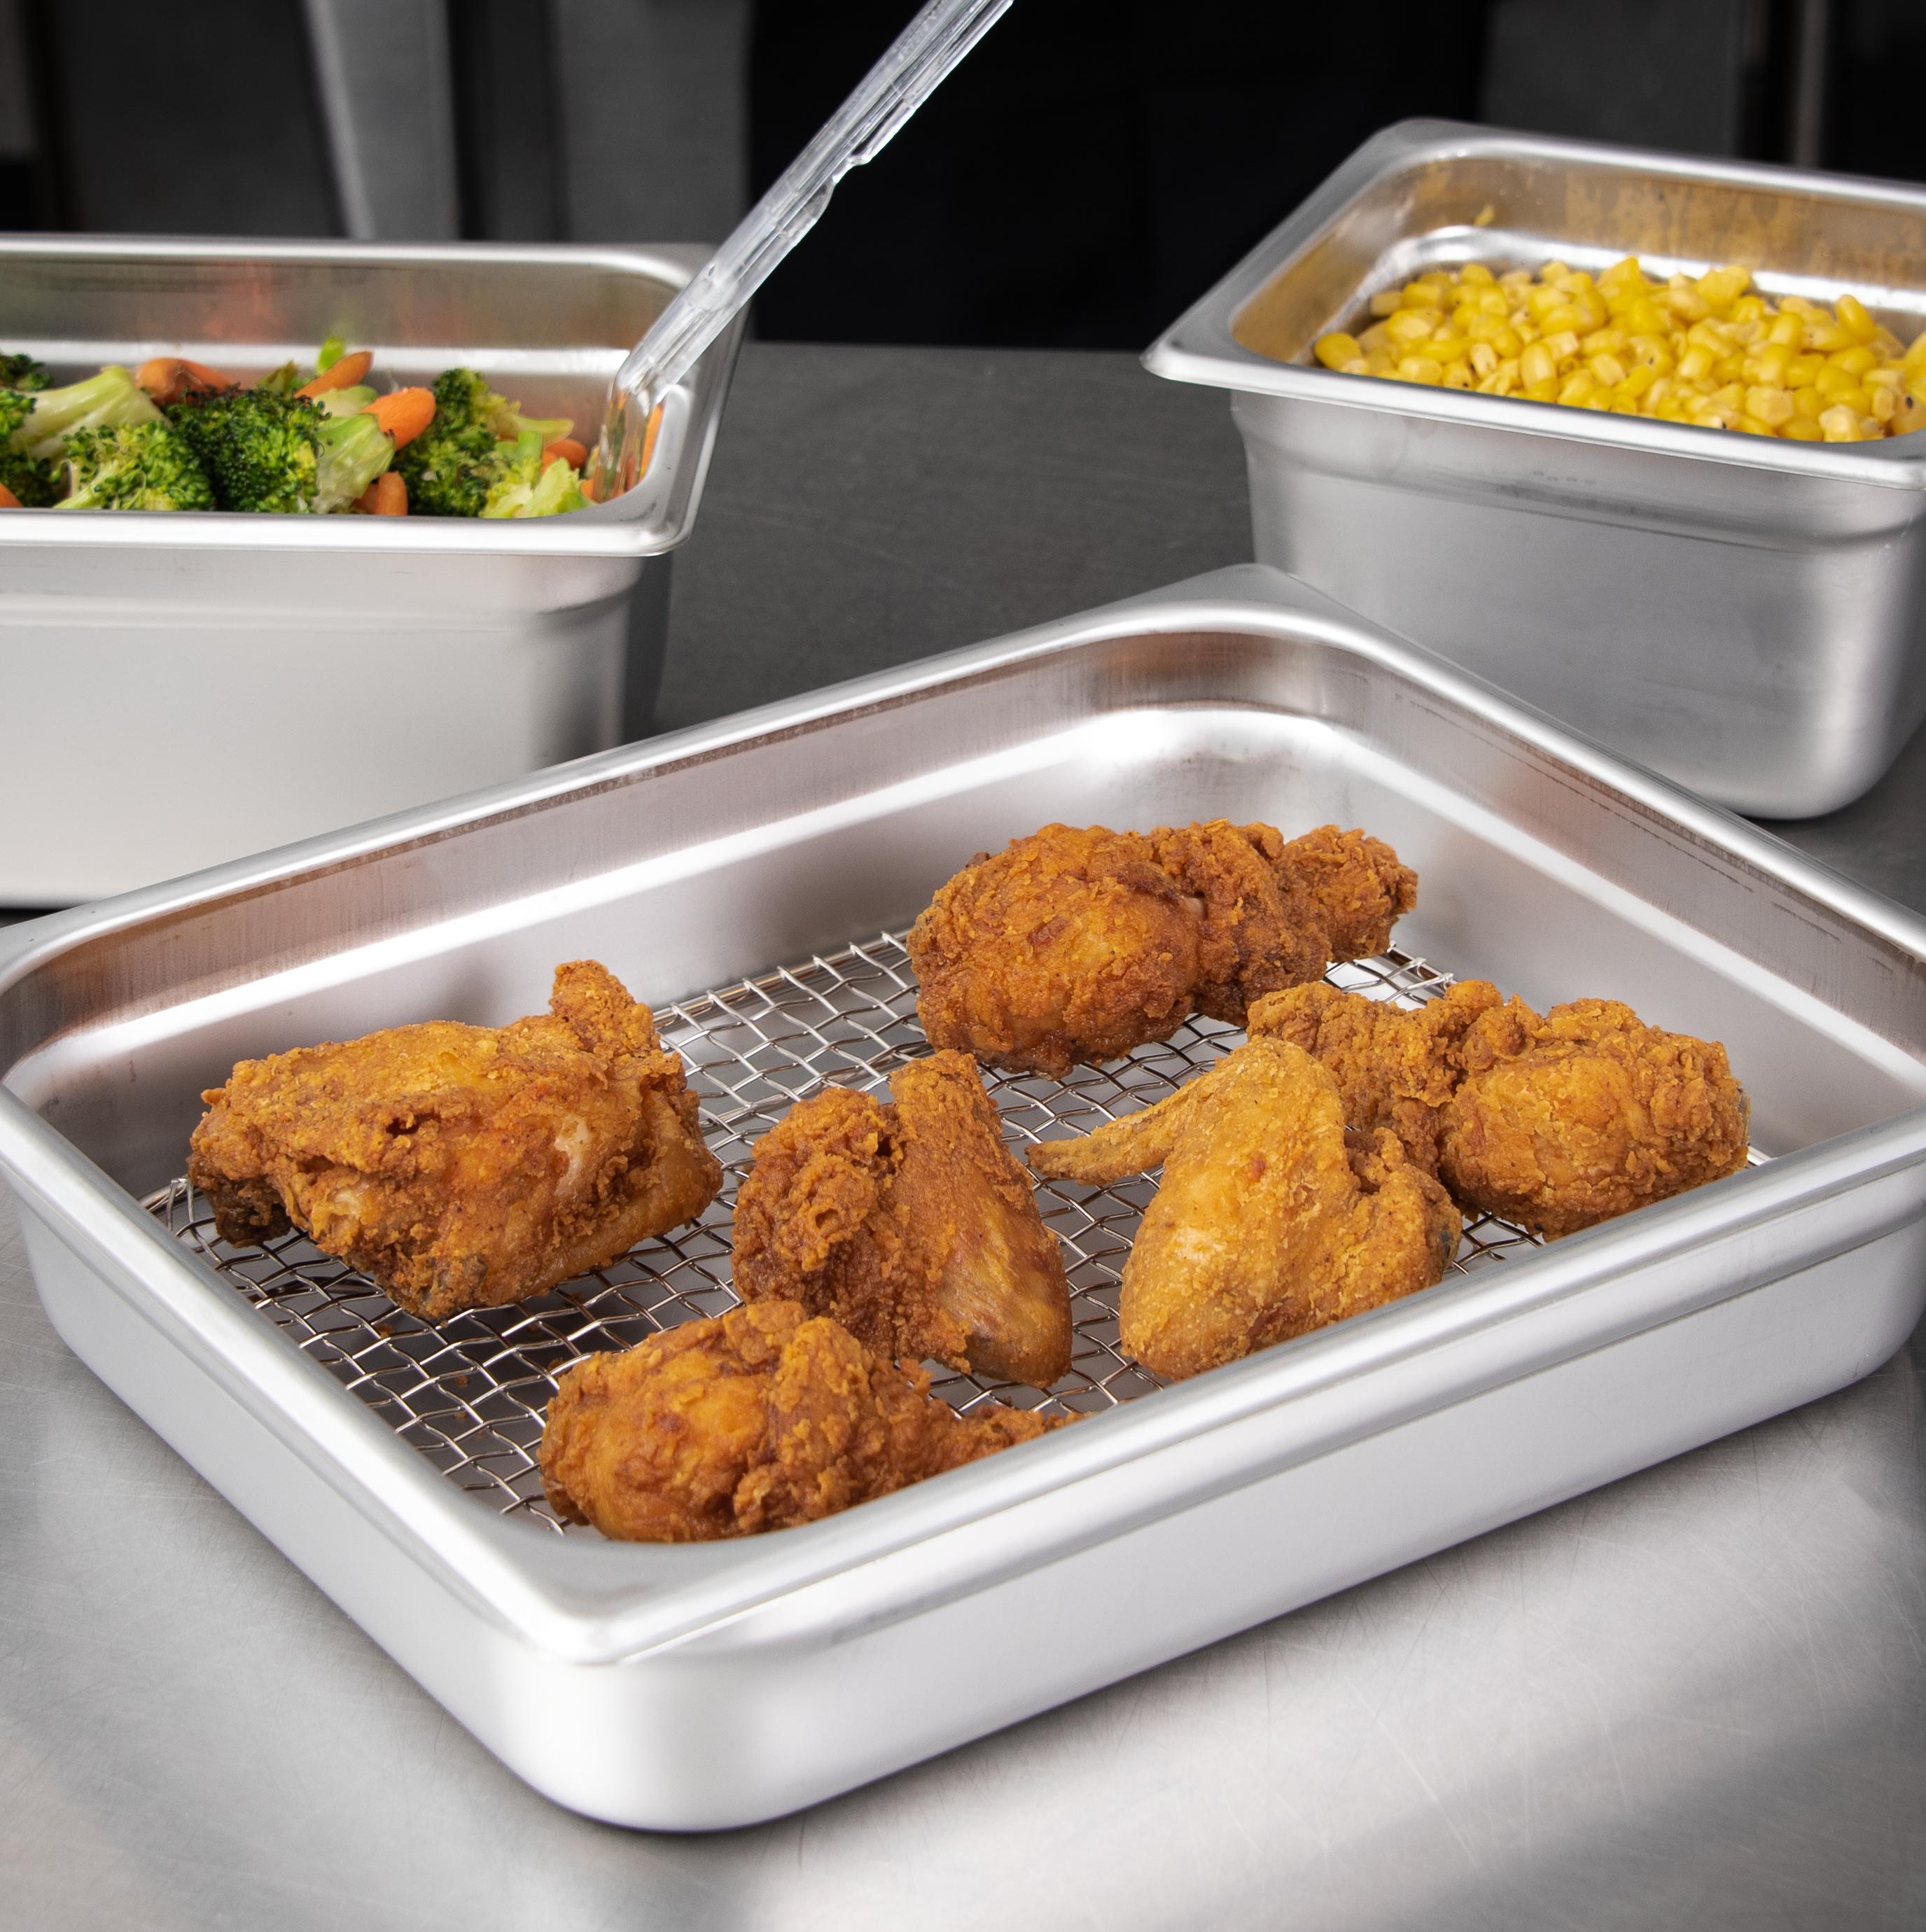 Carlisle 602203 food pans durapan - accessories